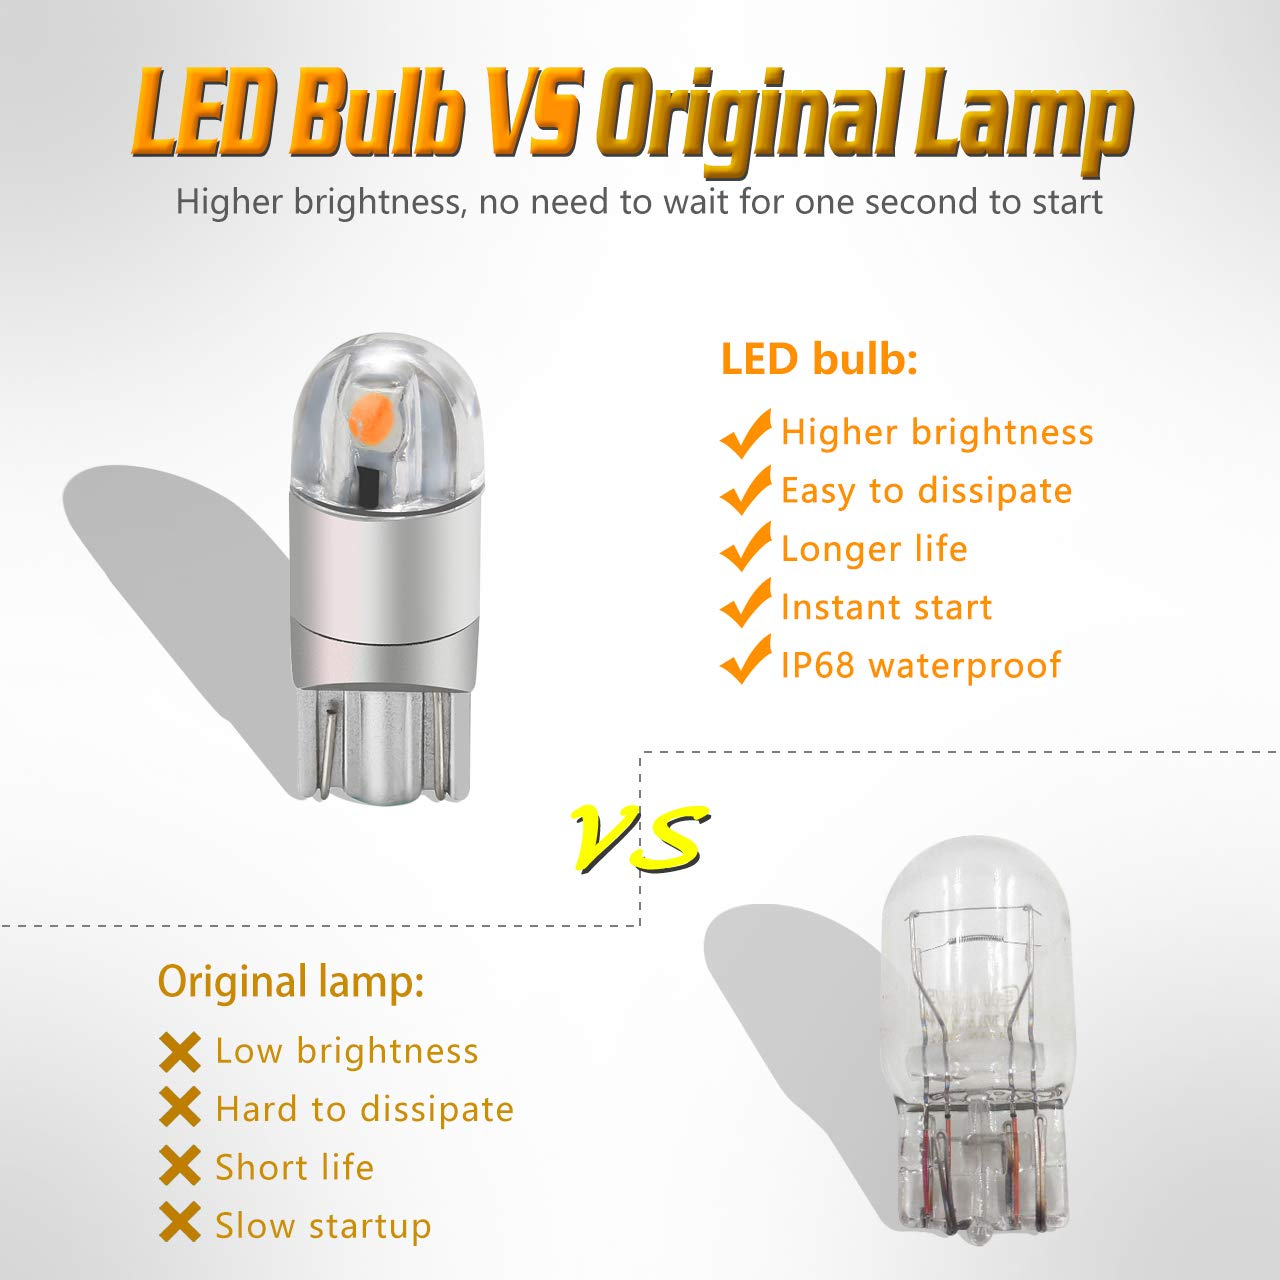 Tuincyn Lampadina bianca a LED per interni auto T10/W5W 3030/2SMD luce di retromarcia confezione da 2 luce di ricambio a cupola per targa 360/lumen luci laterali di direzione